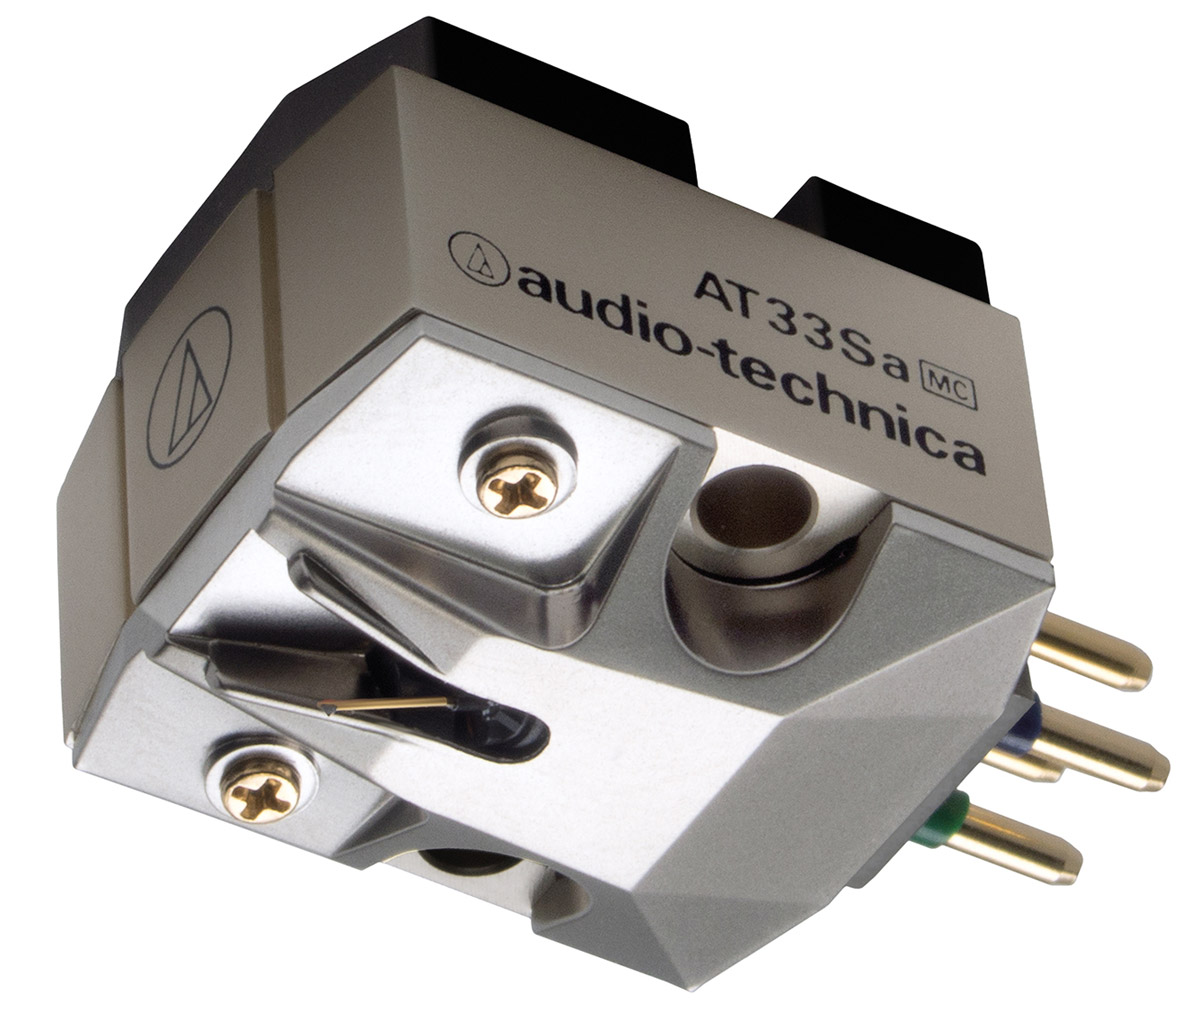 Audio-Technica AT33Sa головка звукоснимателя - Hi-Fi компоненты